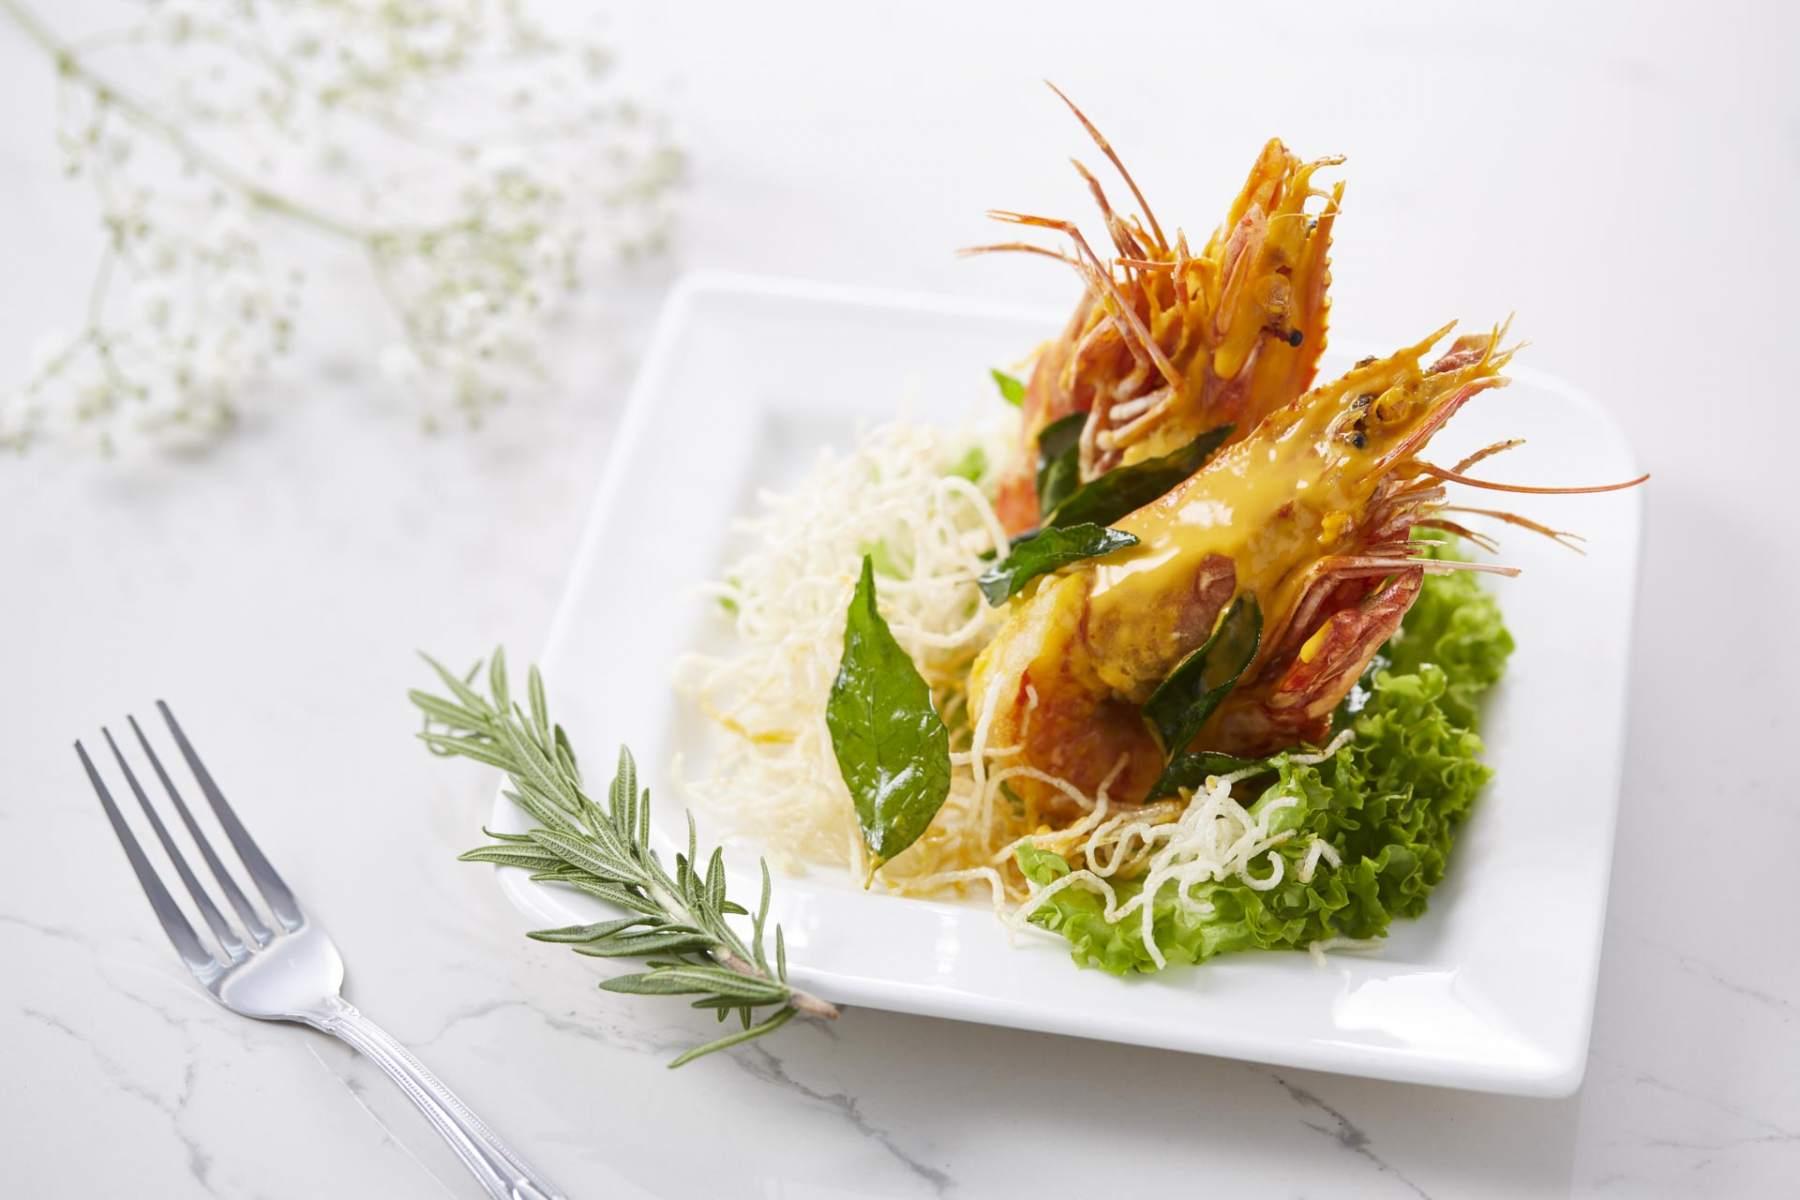 Food-Photography-Singapore-Nosh-22741